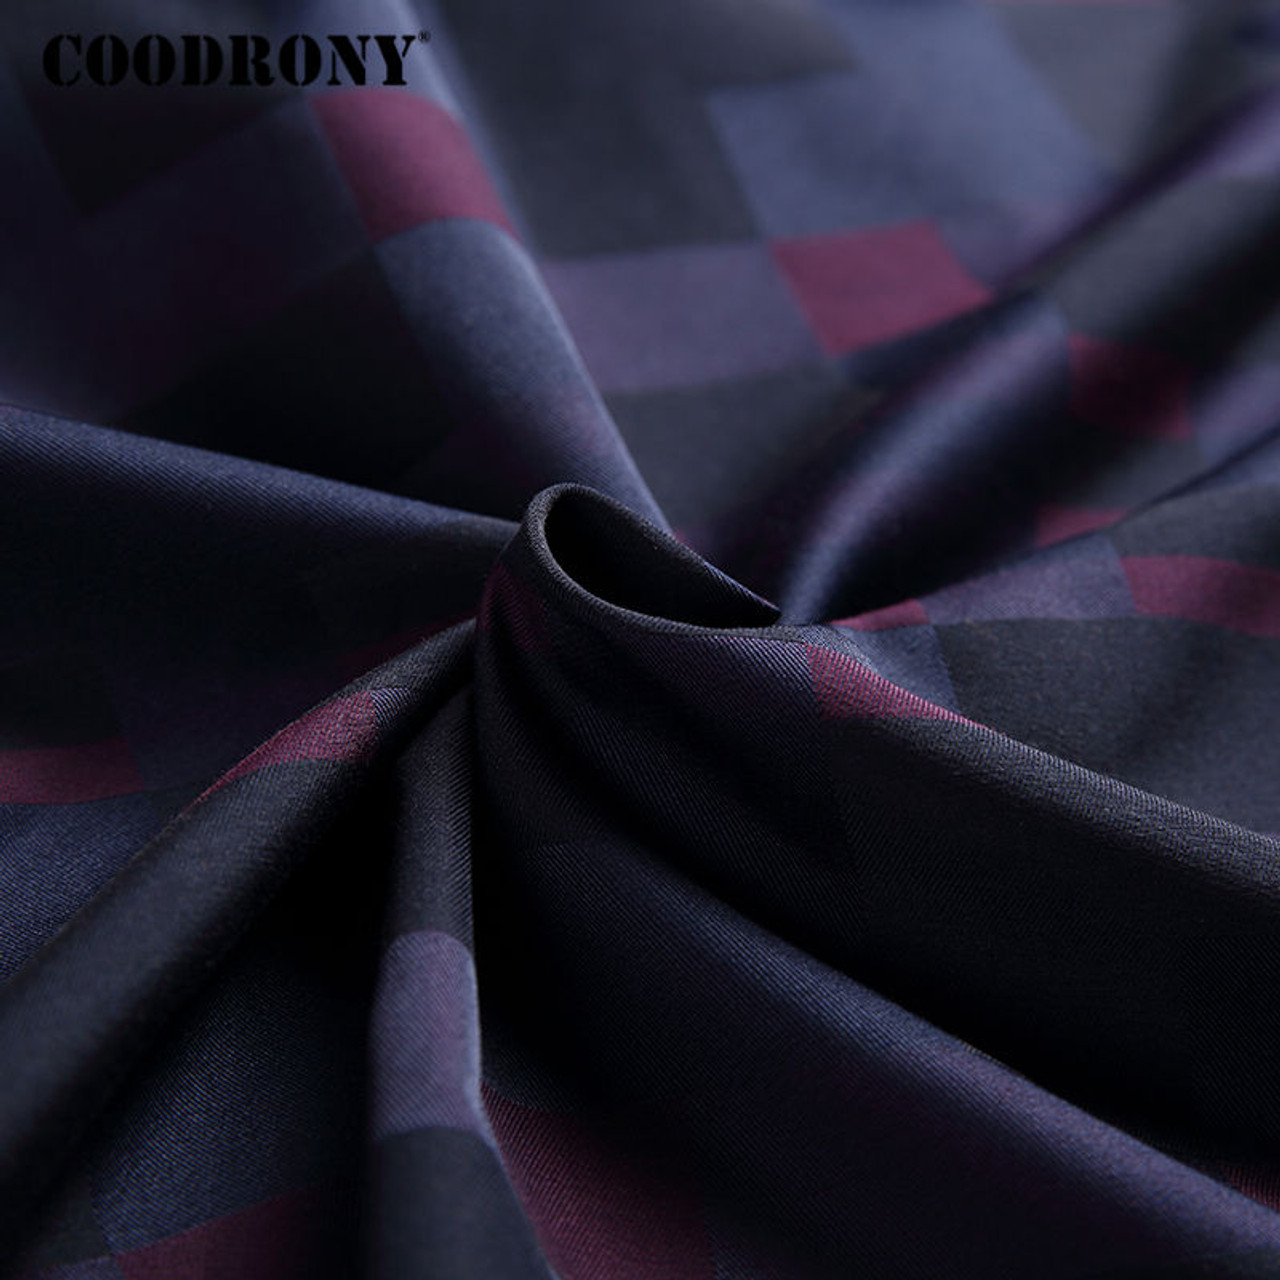 df6156b1030 ... COODRONY Men Shirt Mens Business Casual Shirts 2017 New Arrival Men  Famous Brand Clothing Plaid Long ...